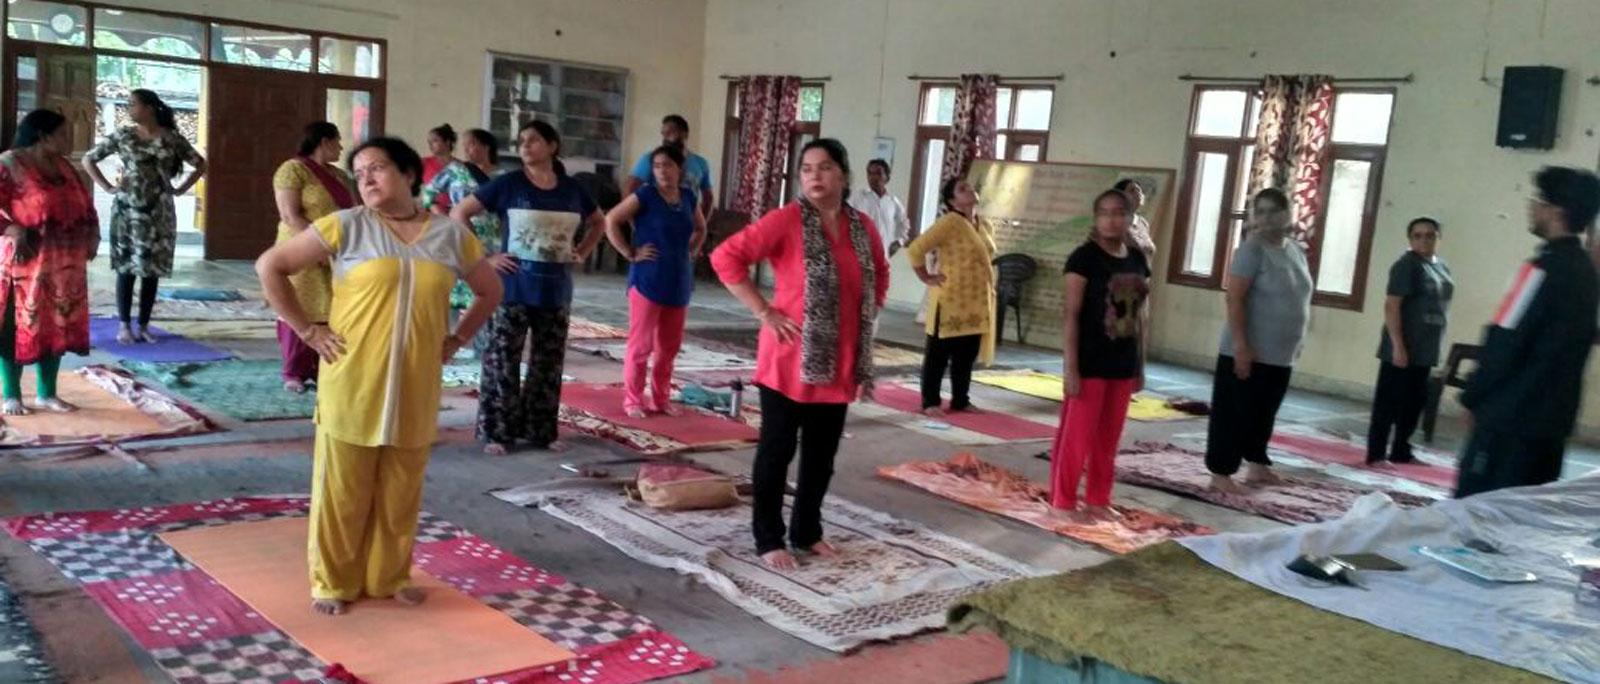 Yoga Classes- At Divine Wellness!